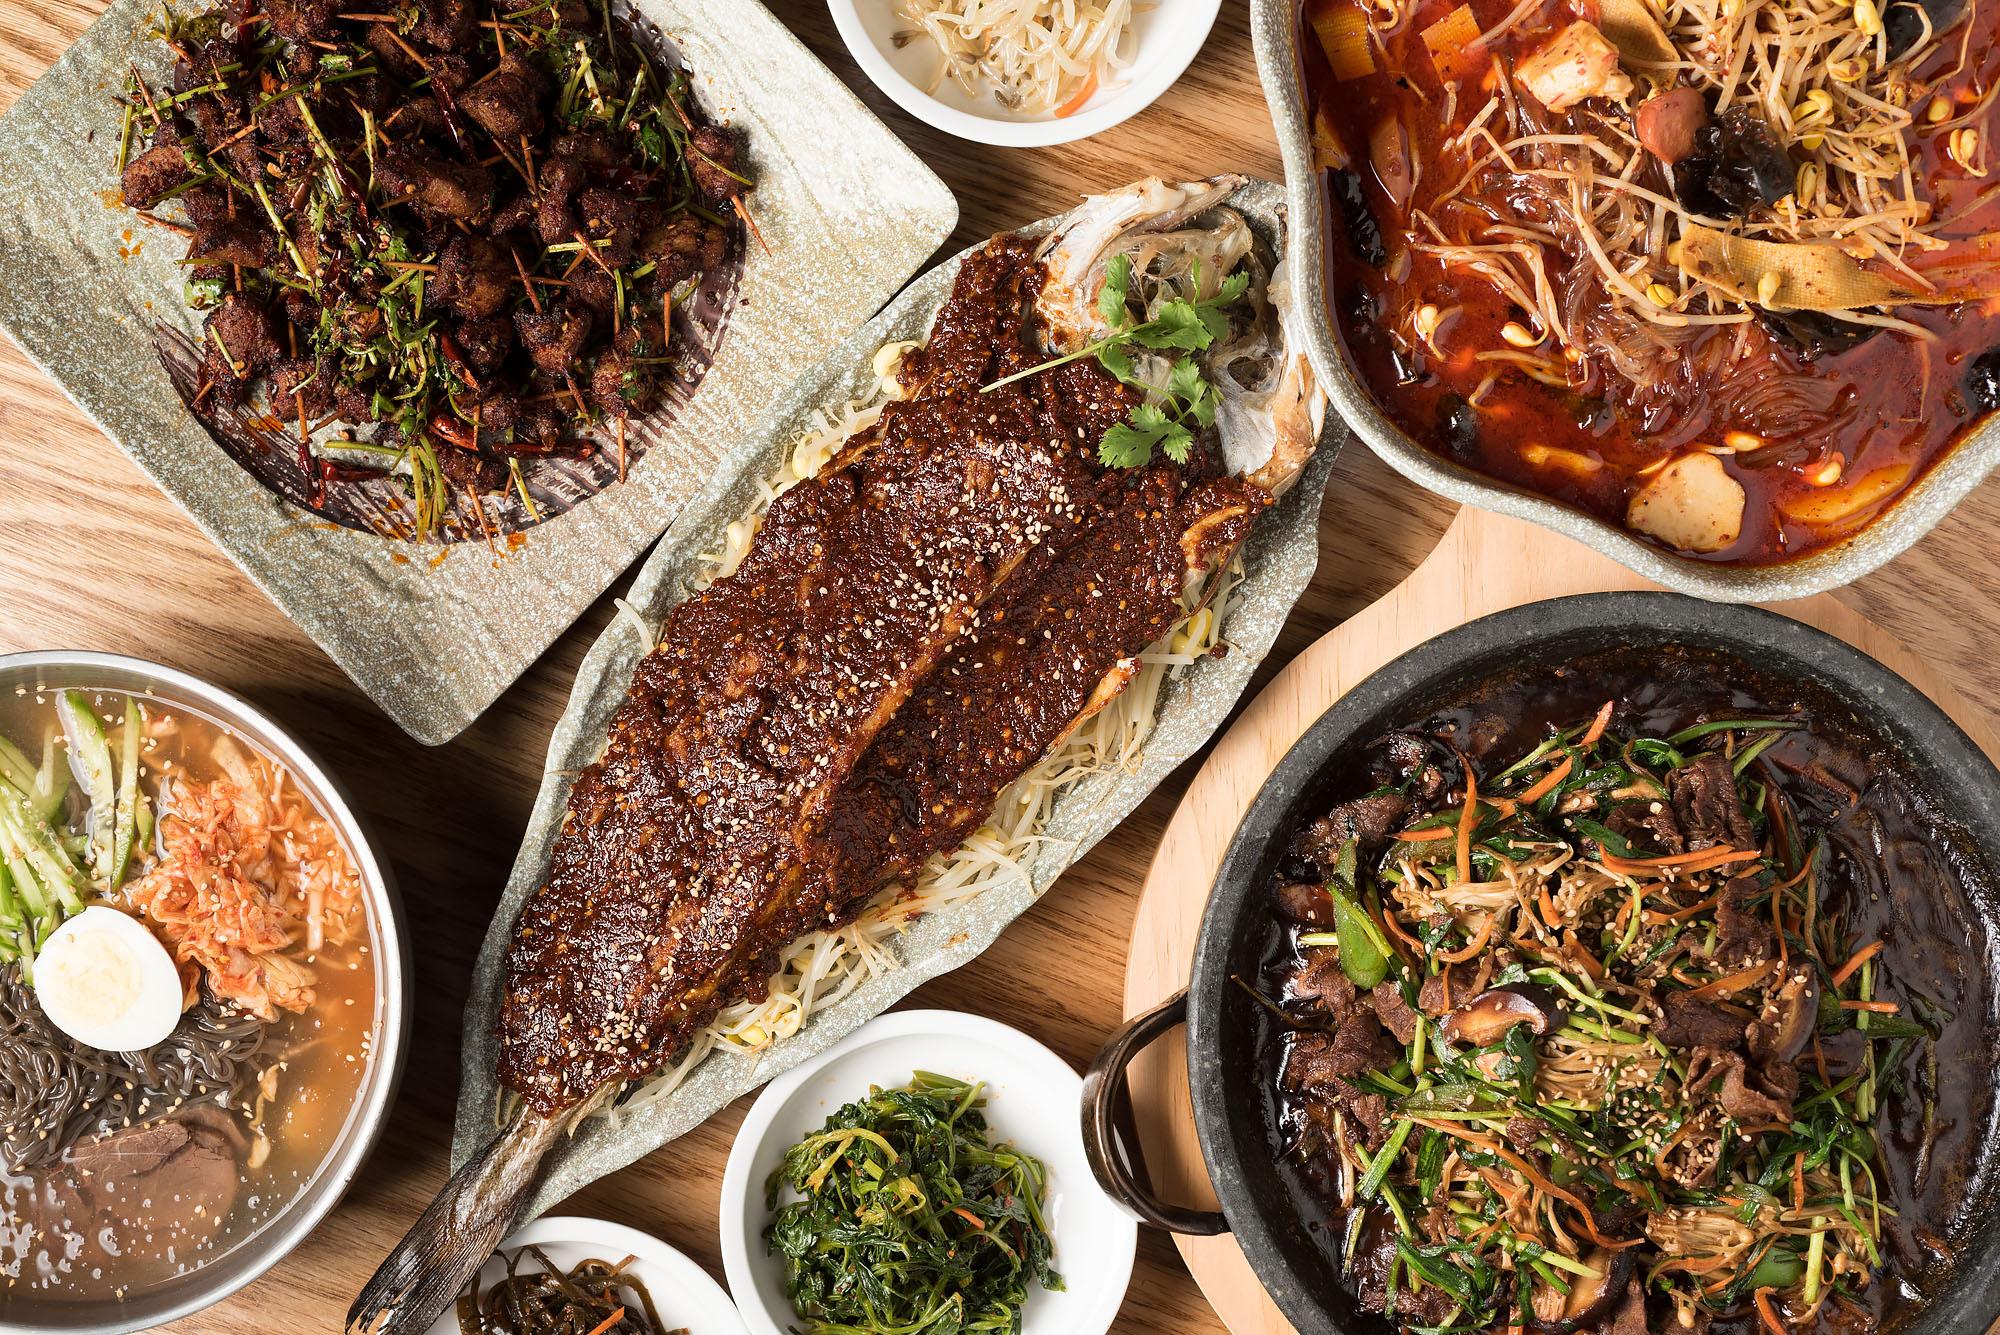 This Korean-Sichuan Restaurant Serves LA's Most Unique Fusions